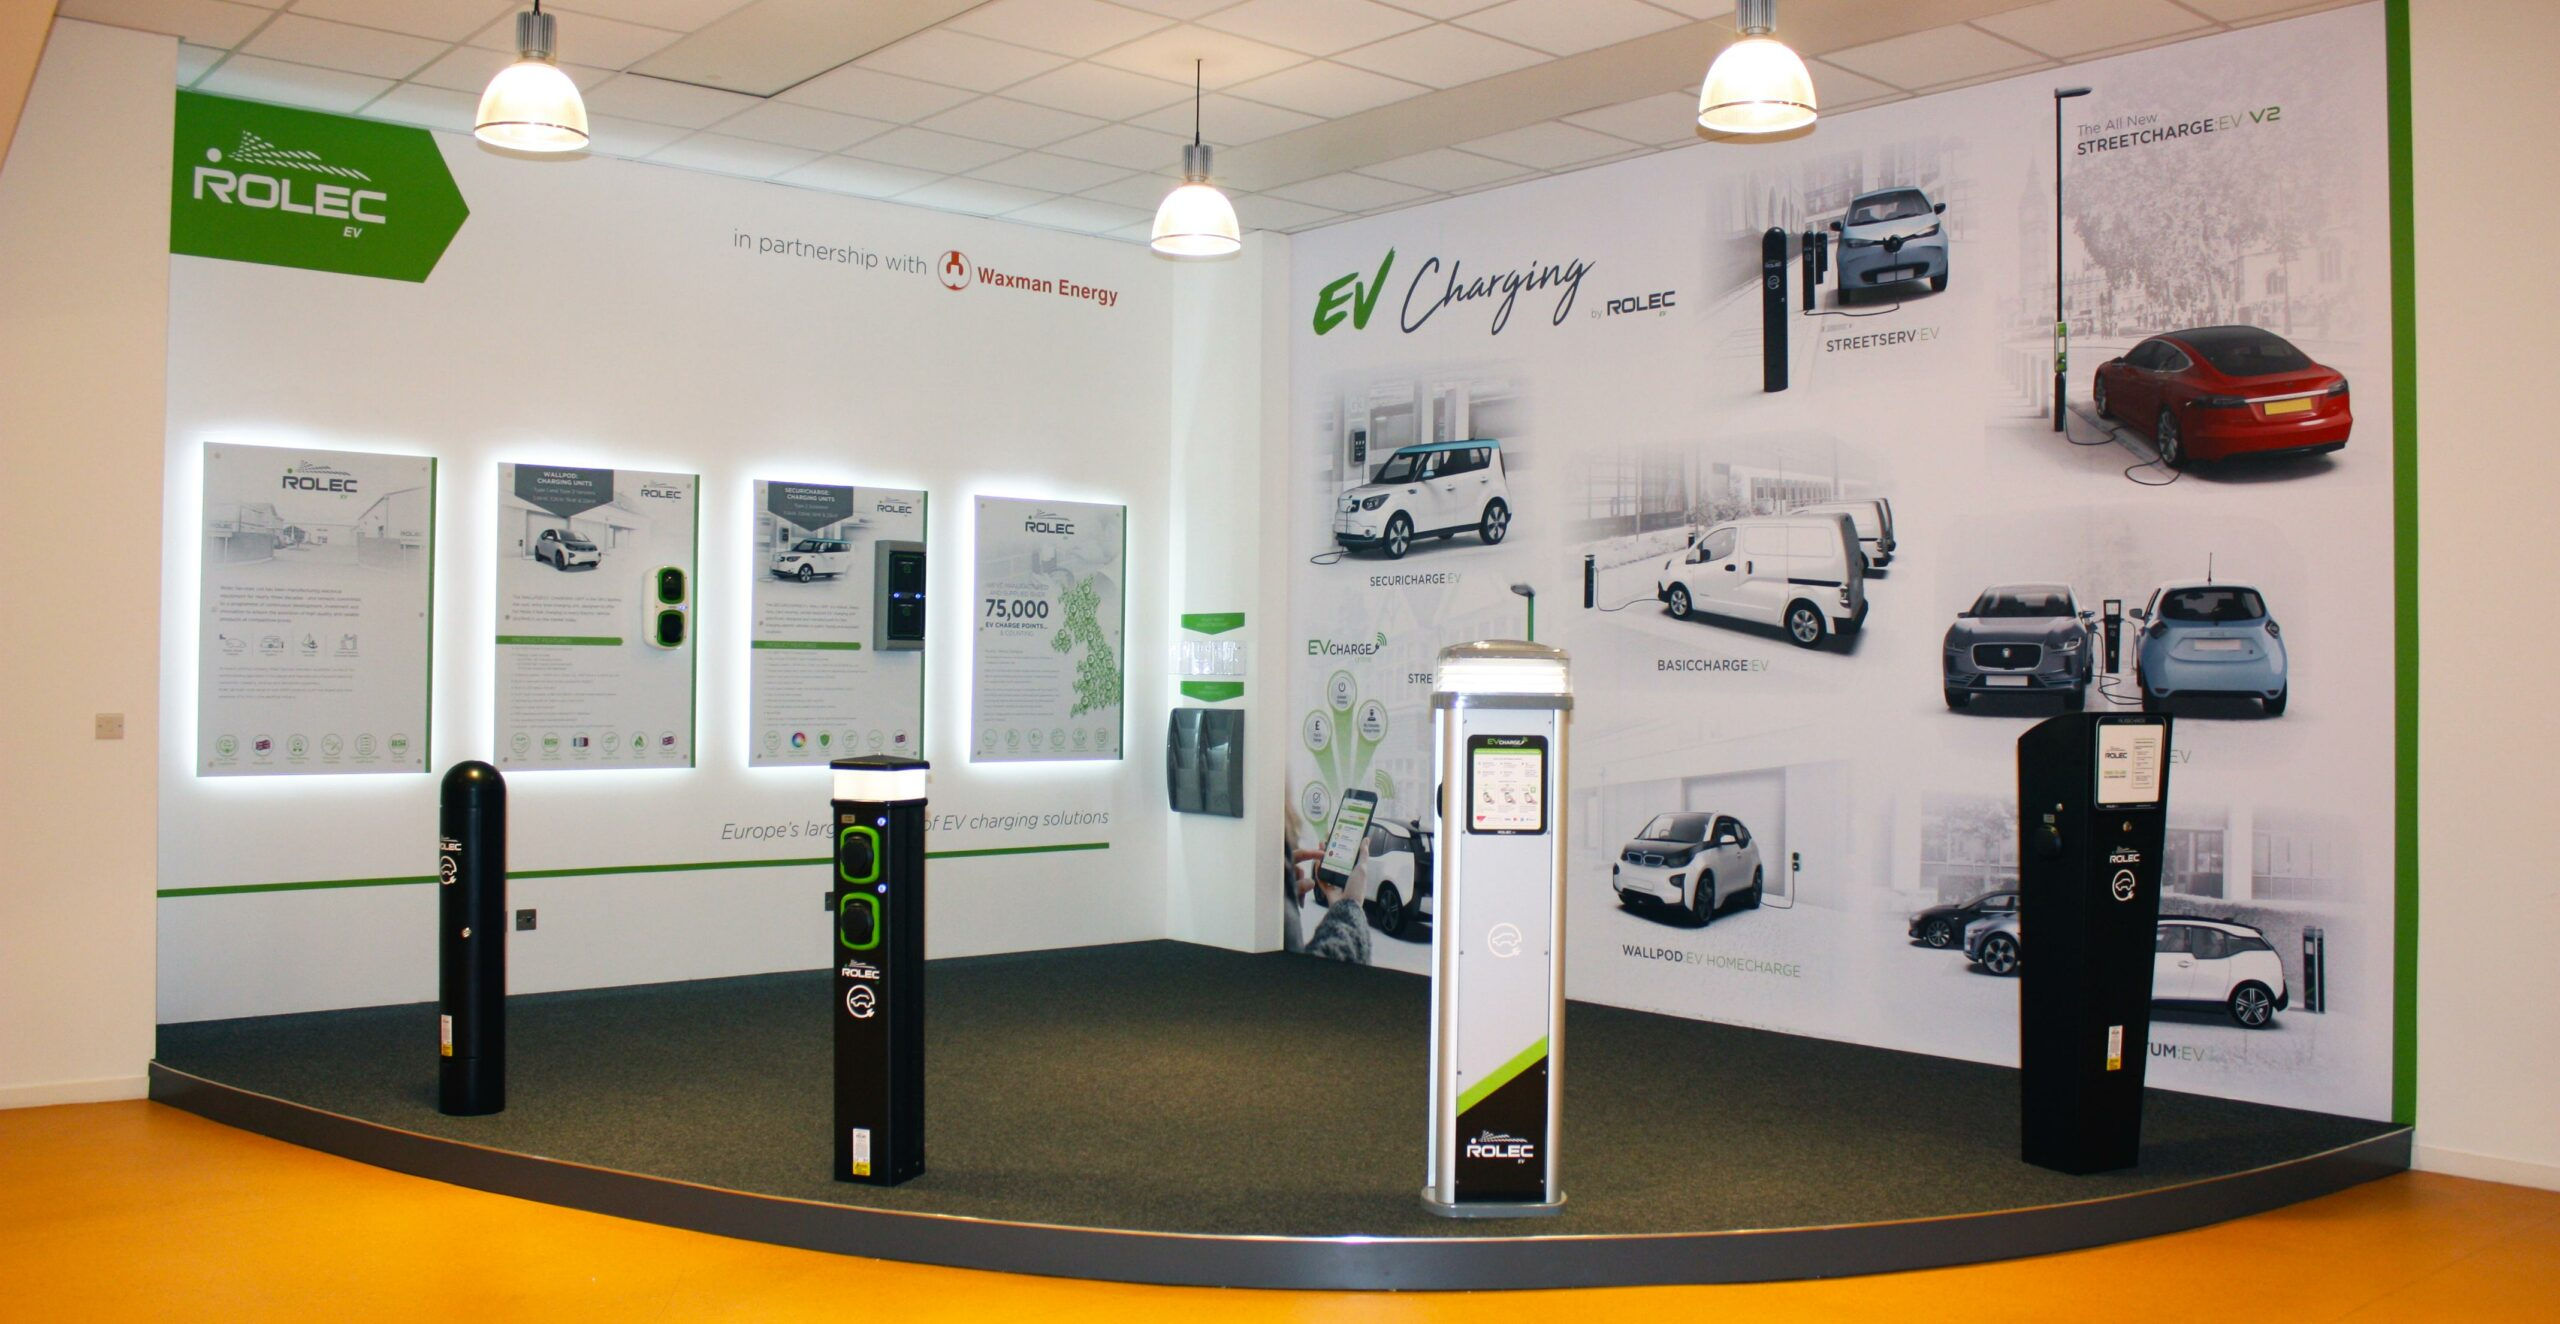 Rolec EV Showroom at Waxman Energy